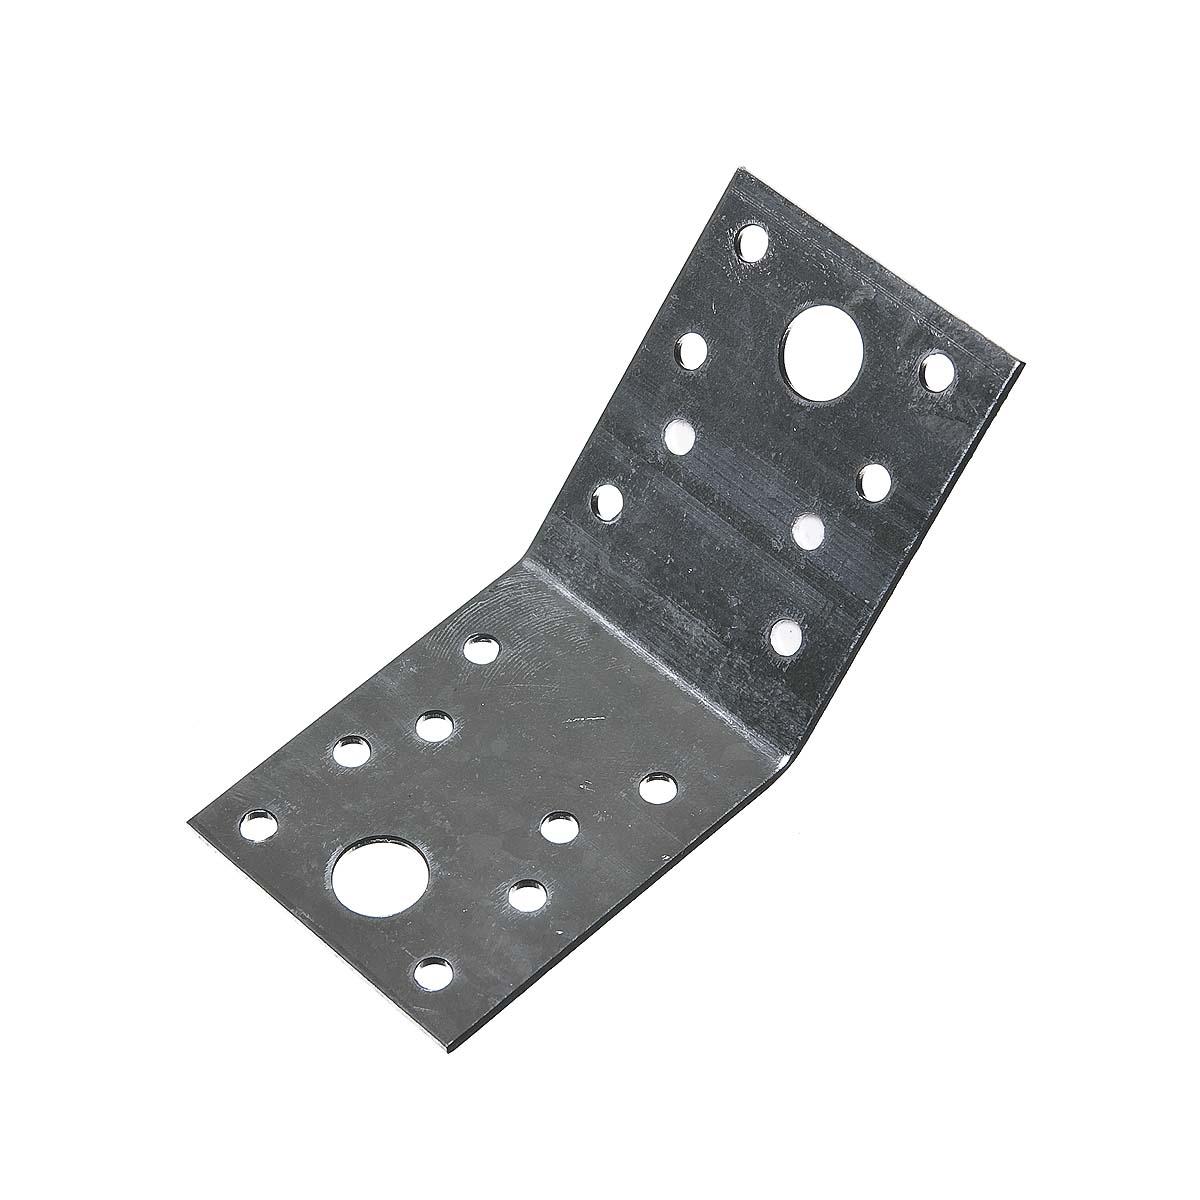 Уголок для стропильных соединений оцинкованный  70х70х55х2 мм 135°